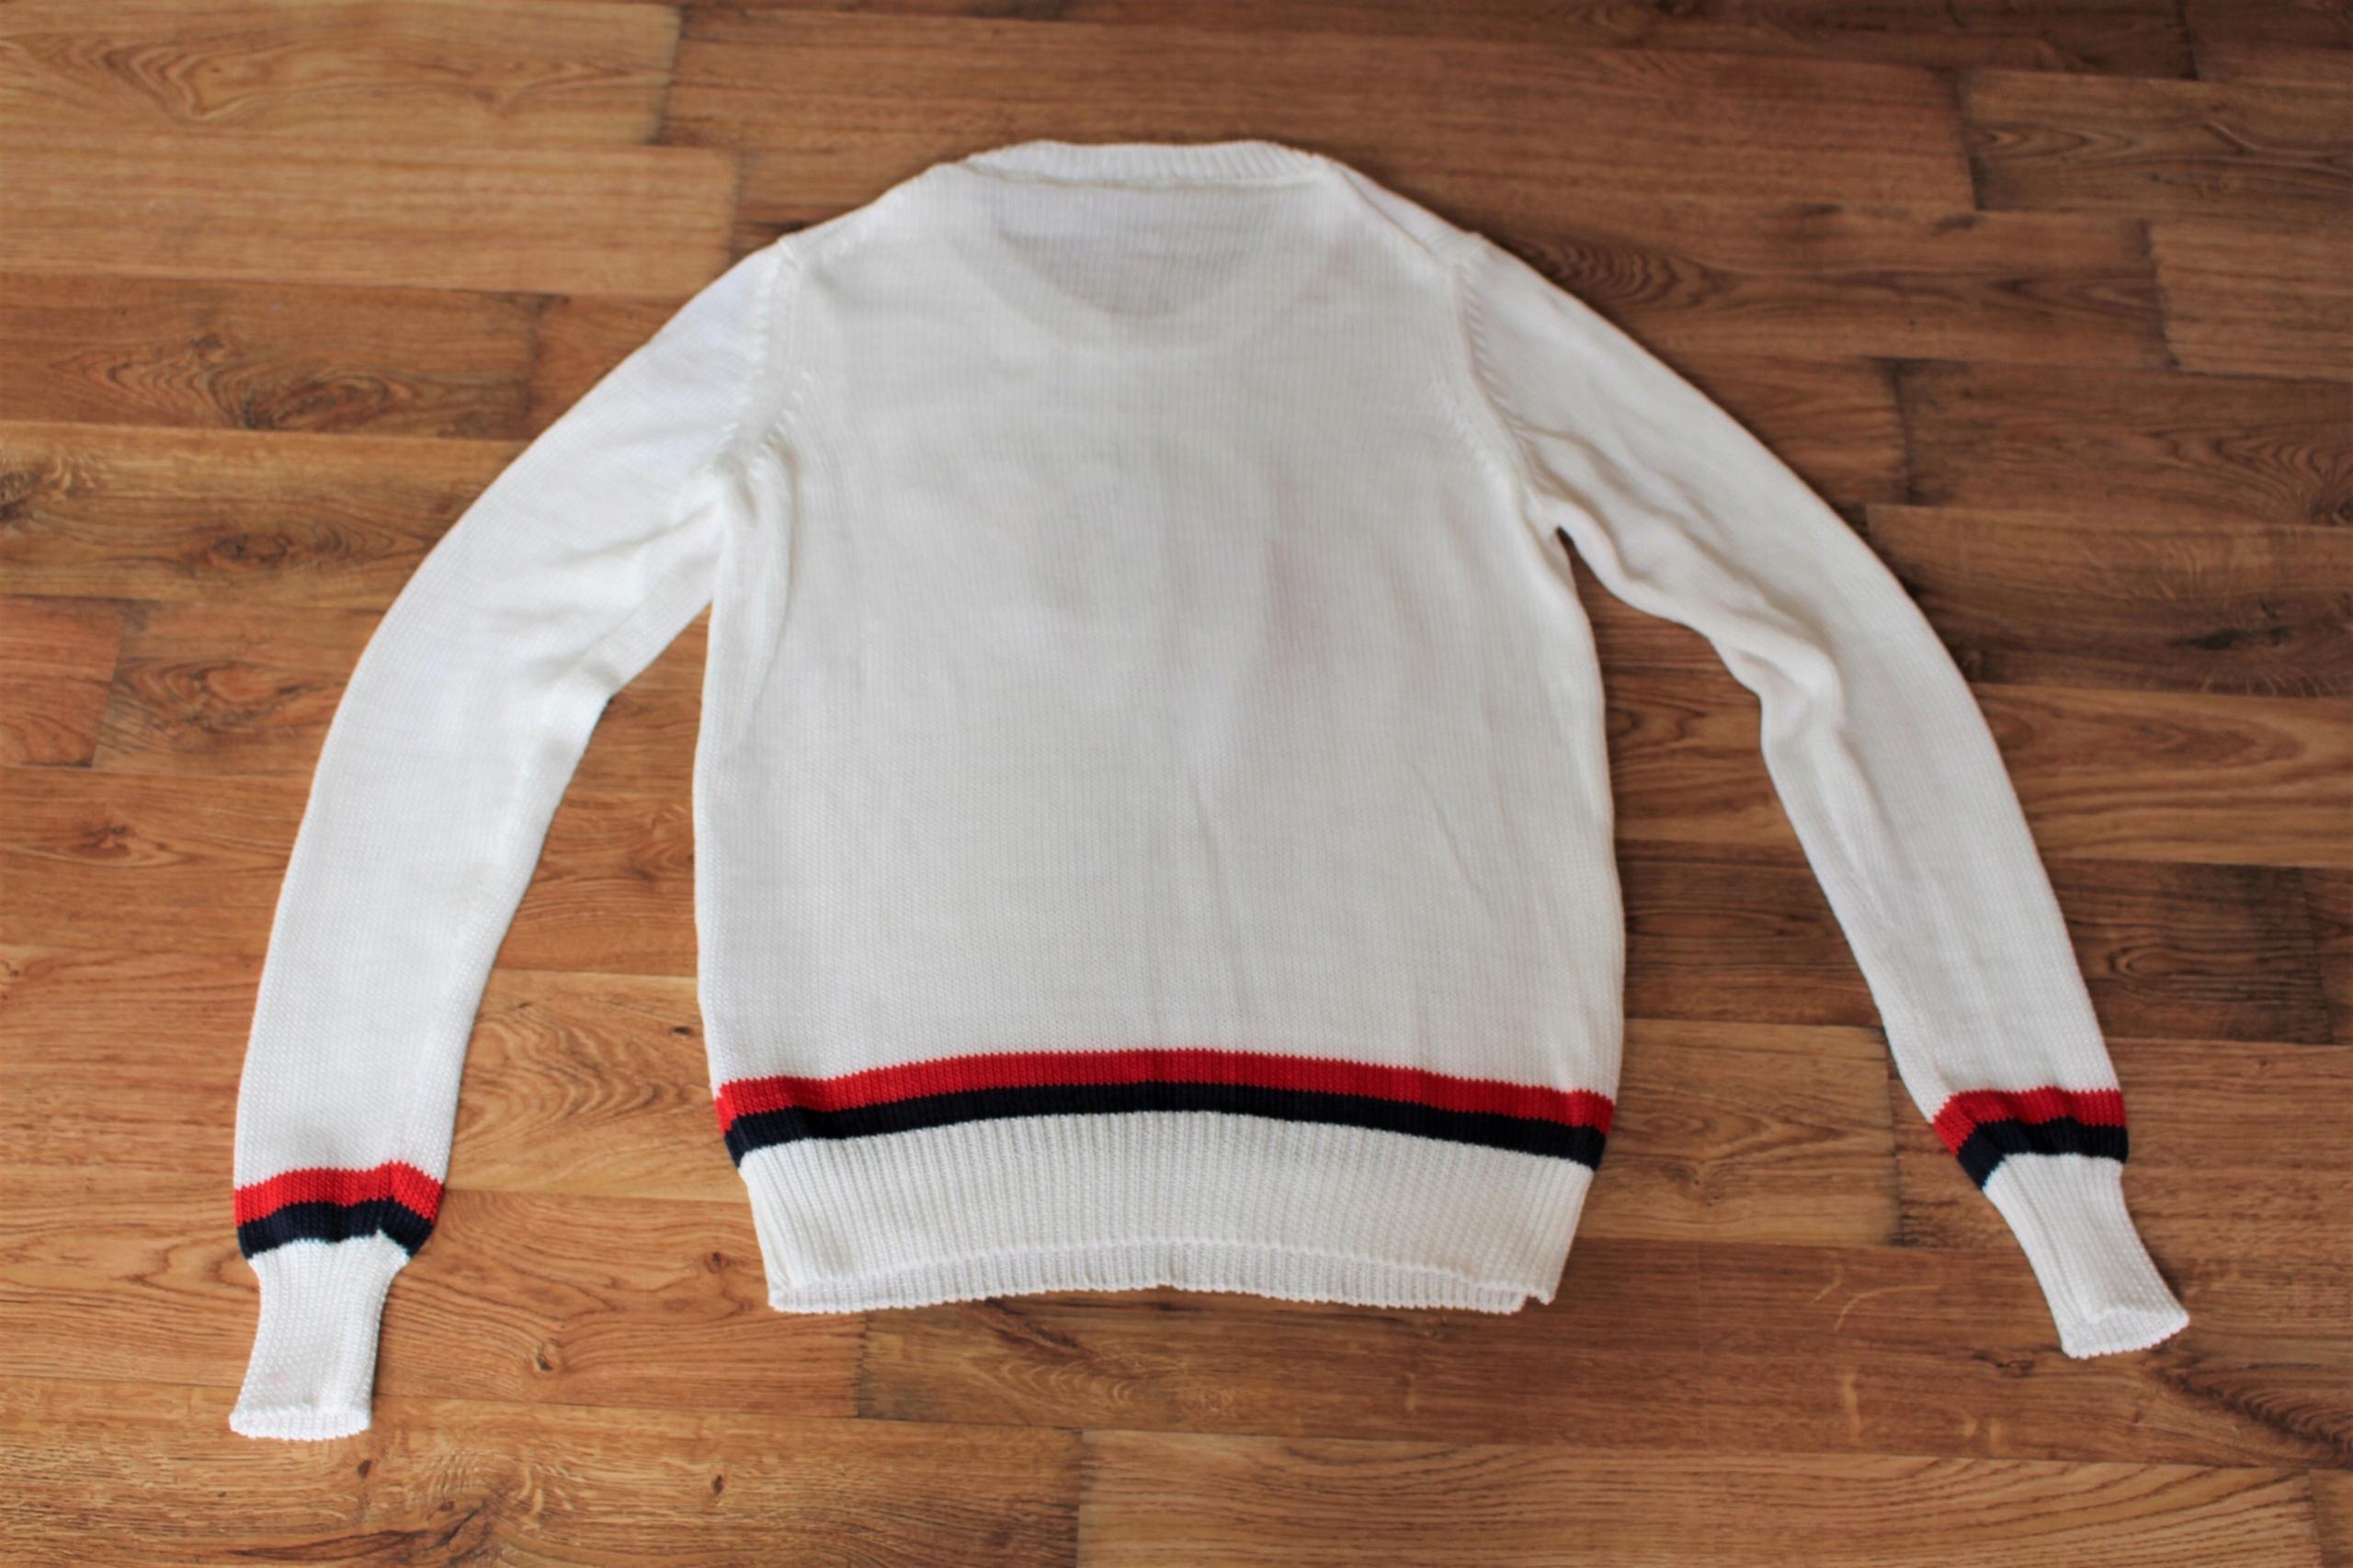 0815edab1 Tommy Hilfiger sweter damski XS/S OKAZJA - 7522017817 - oficjalne ...